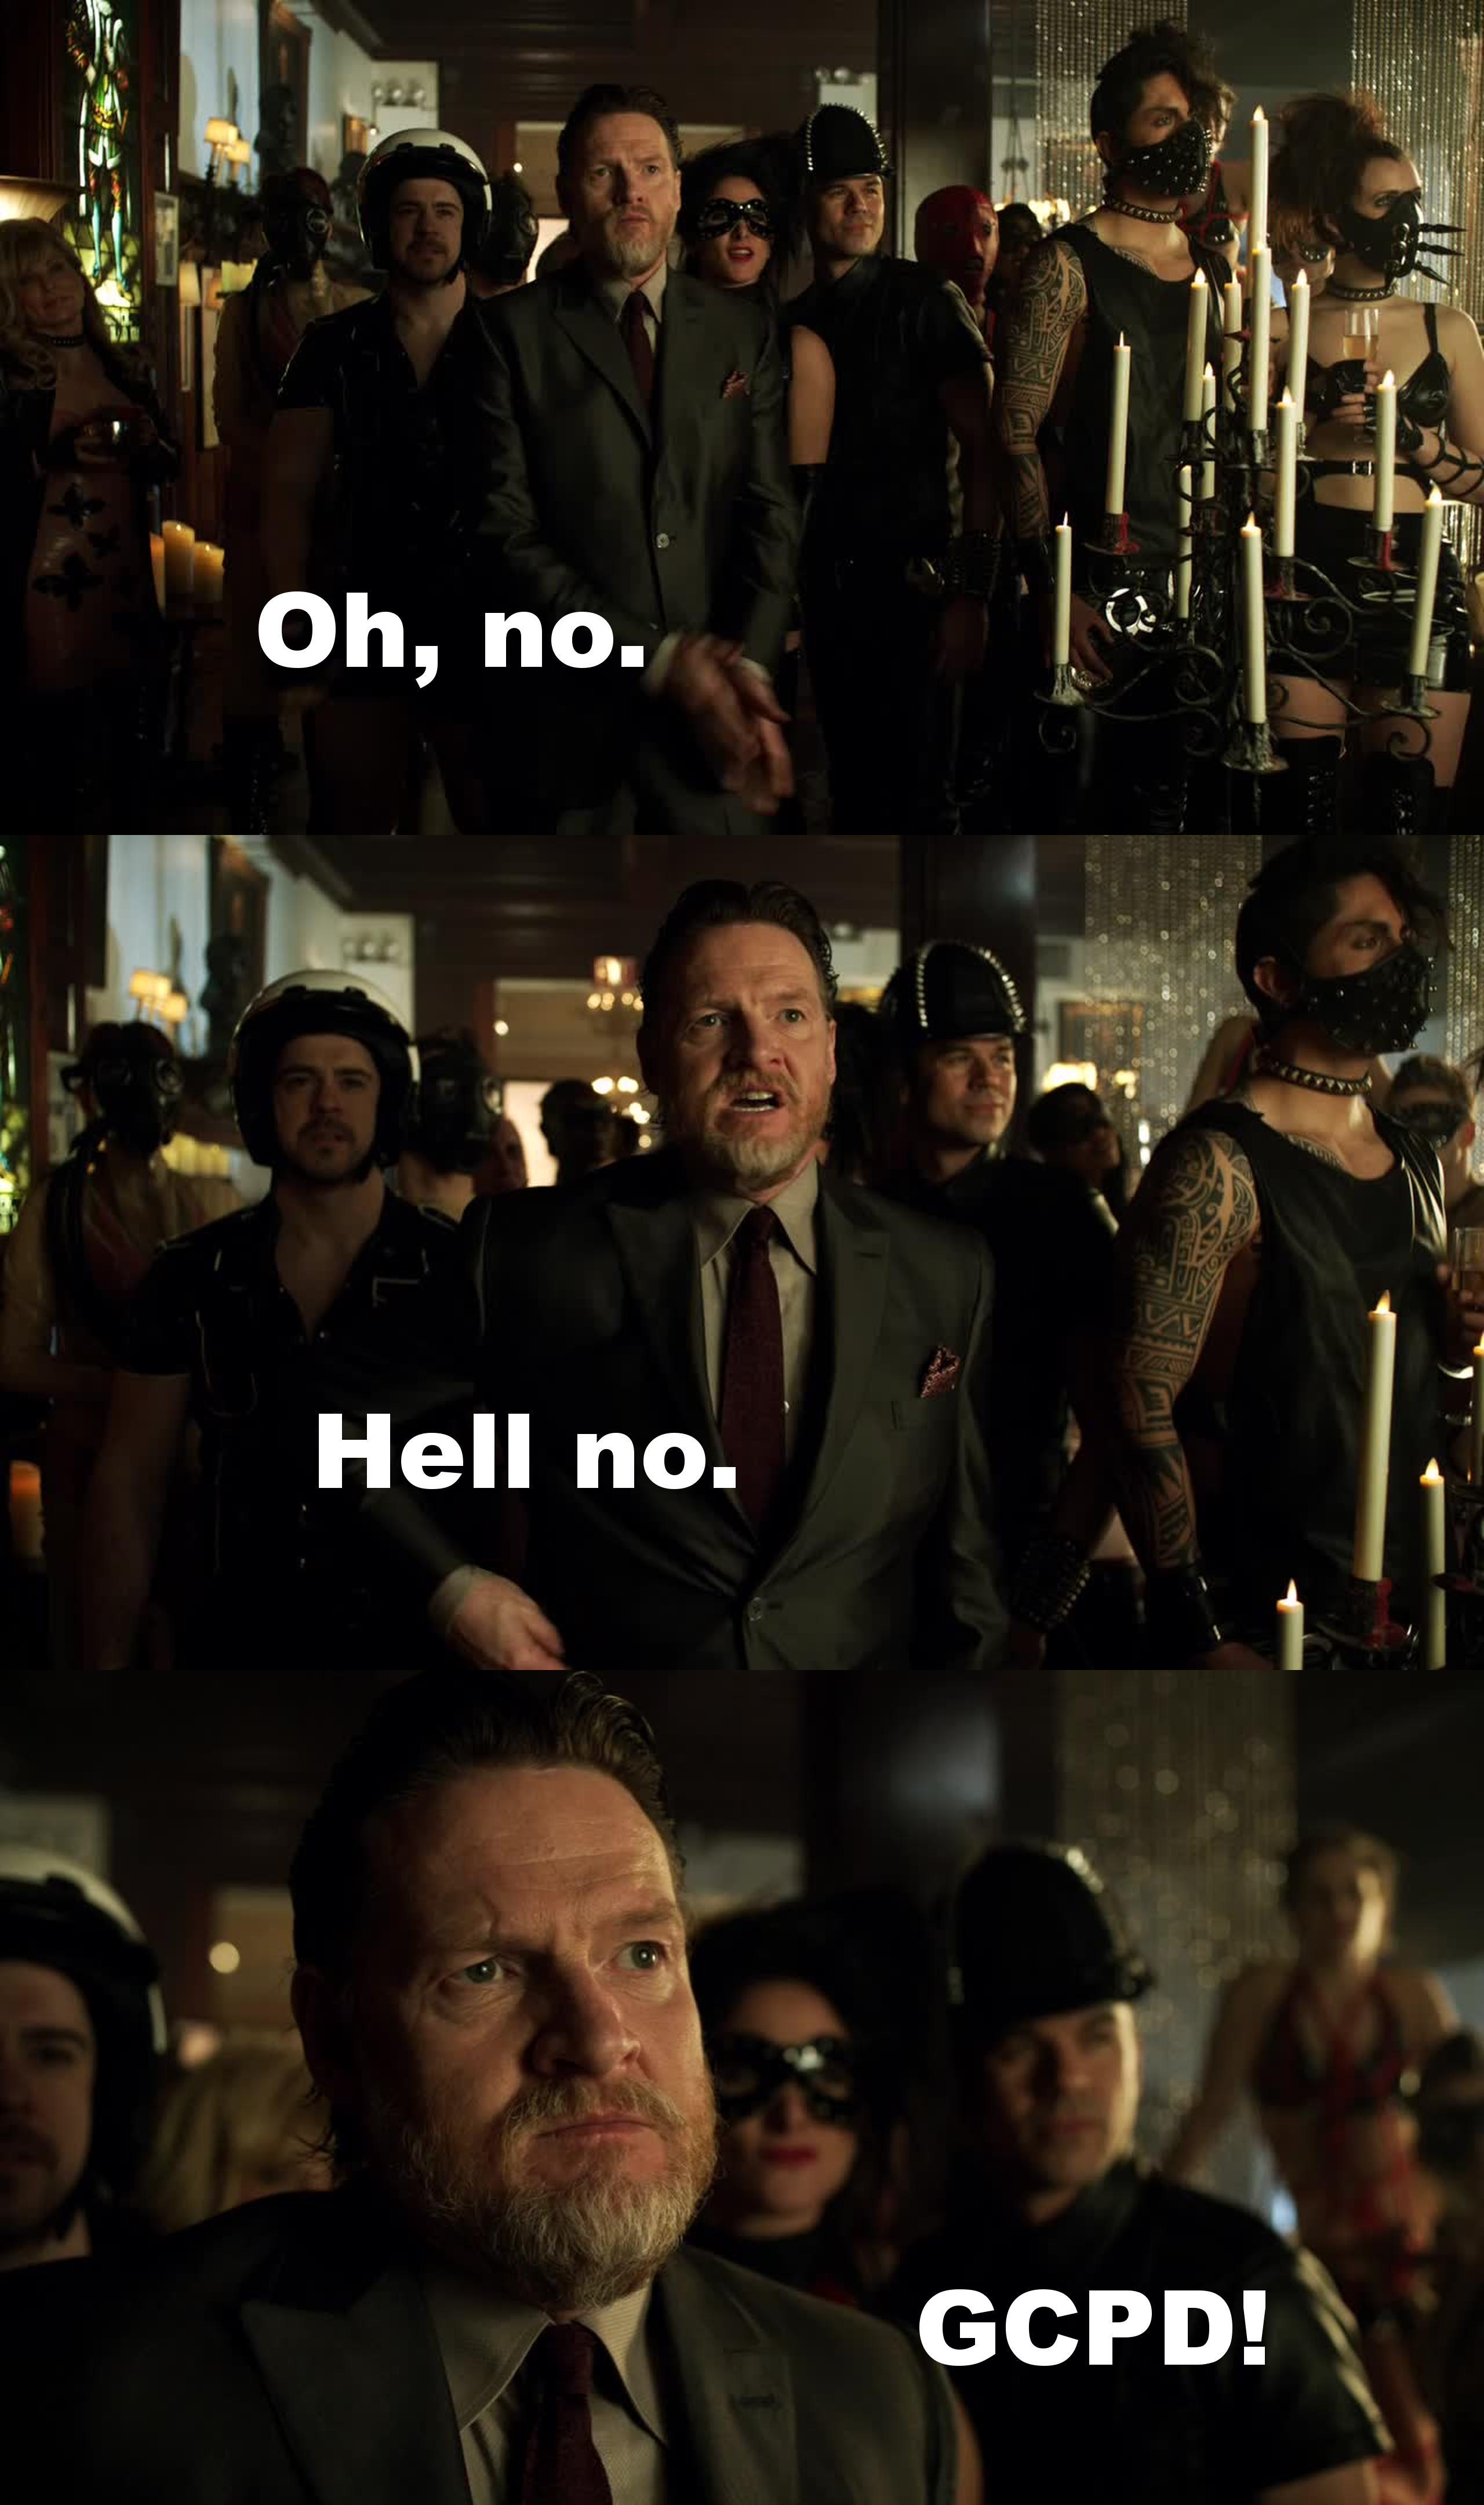 Hahah Harvey the best!